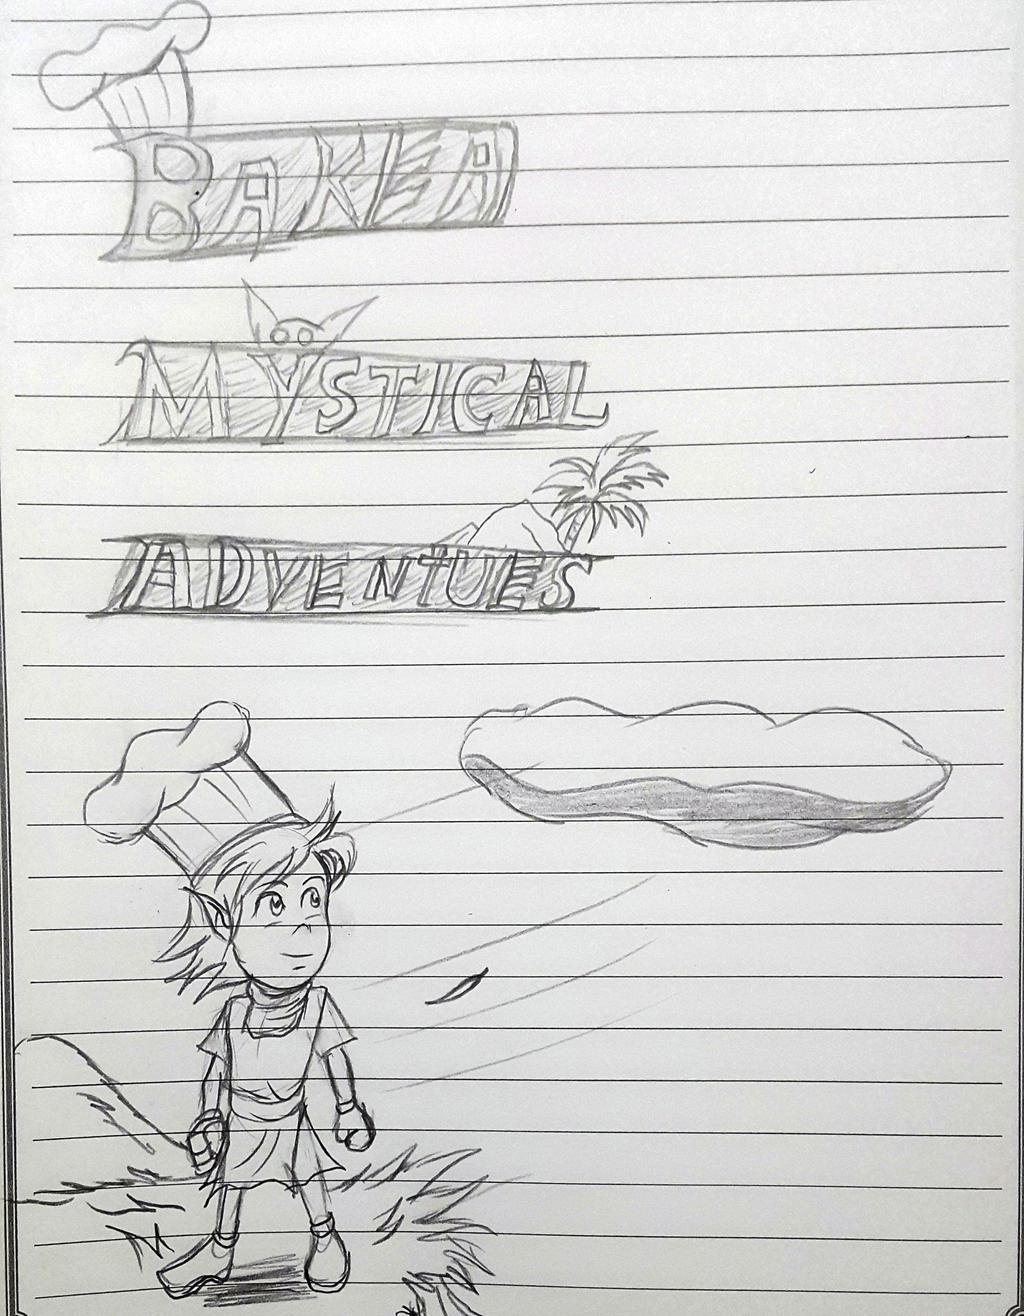 making logo for Baker Mystical Adventures story by ryuu-samazx